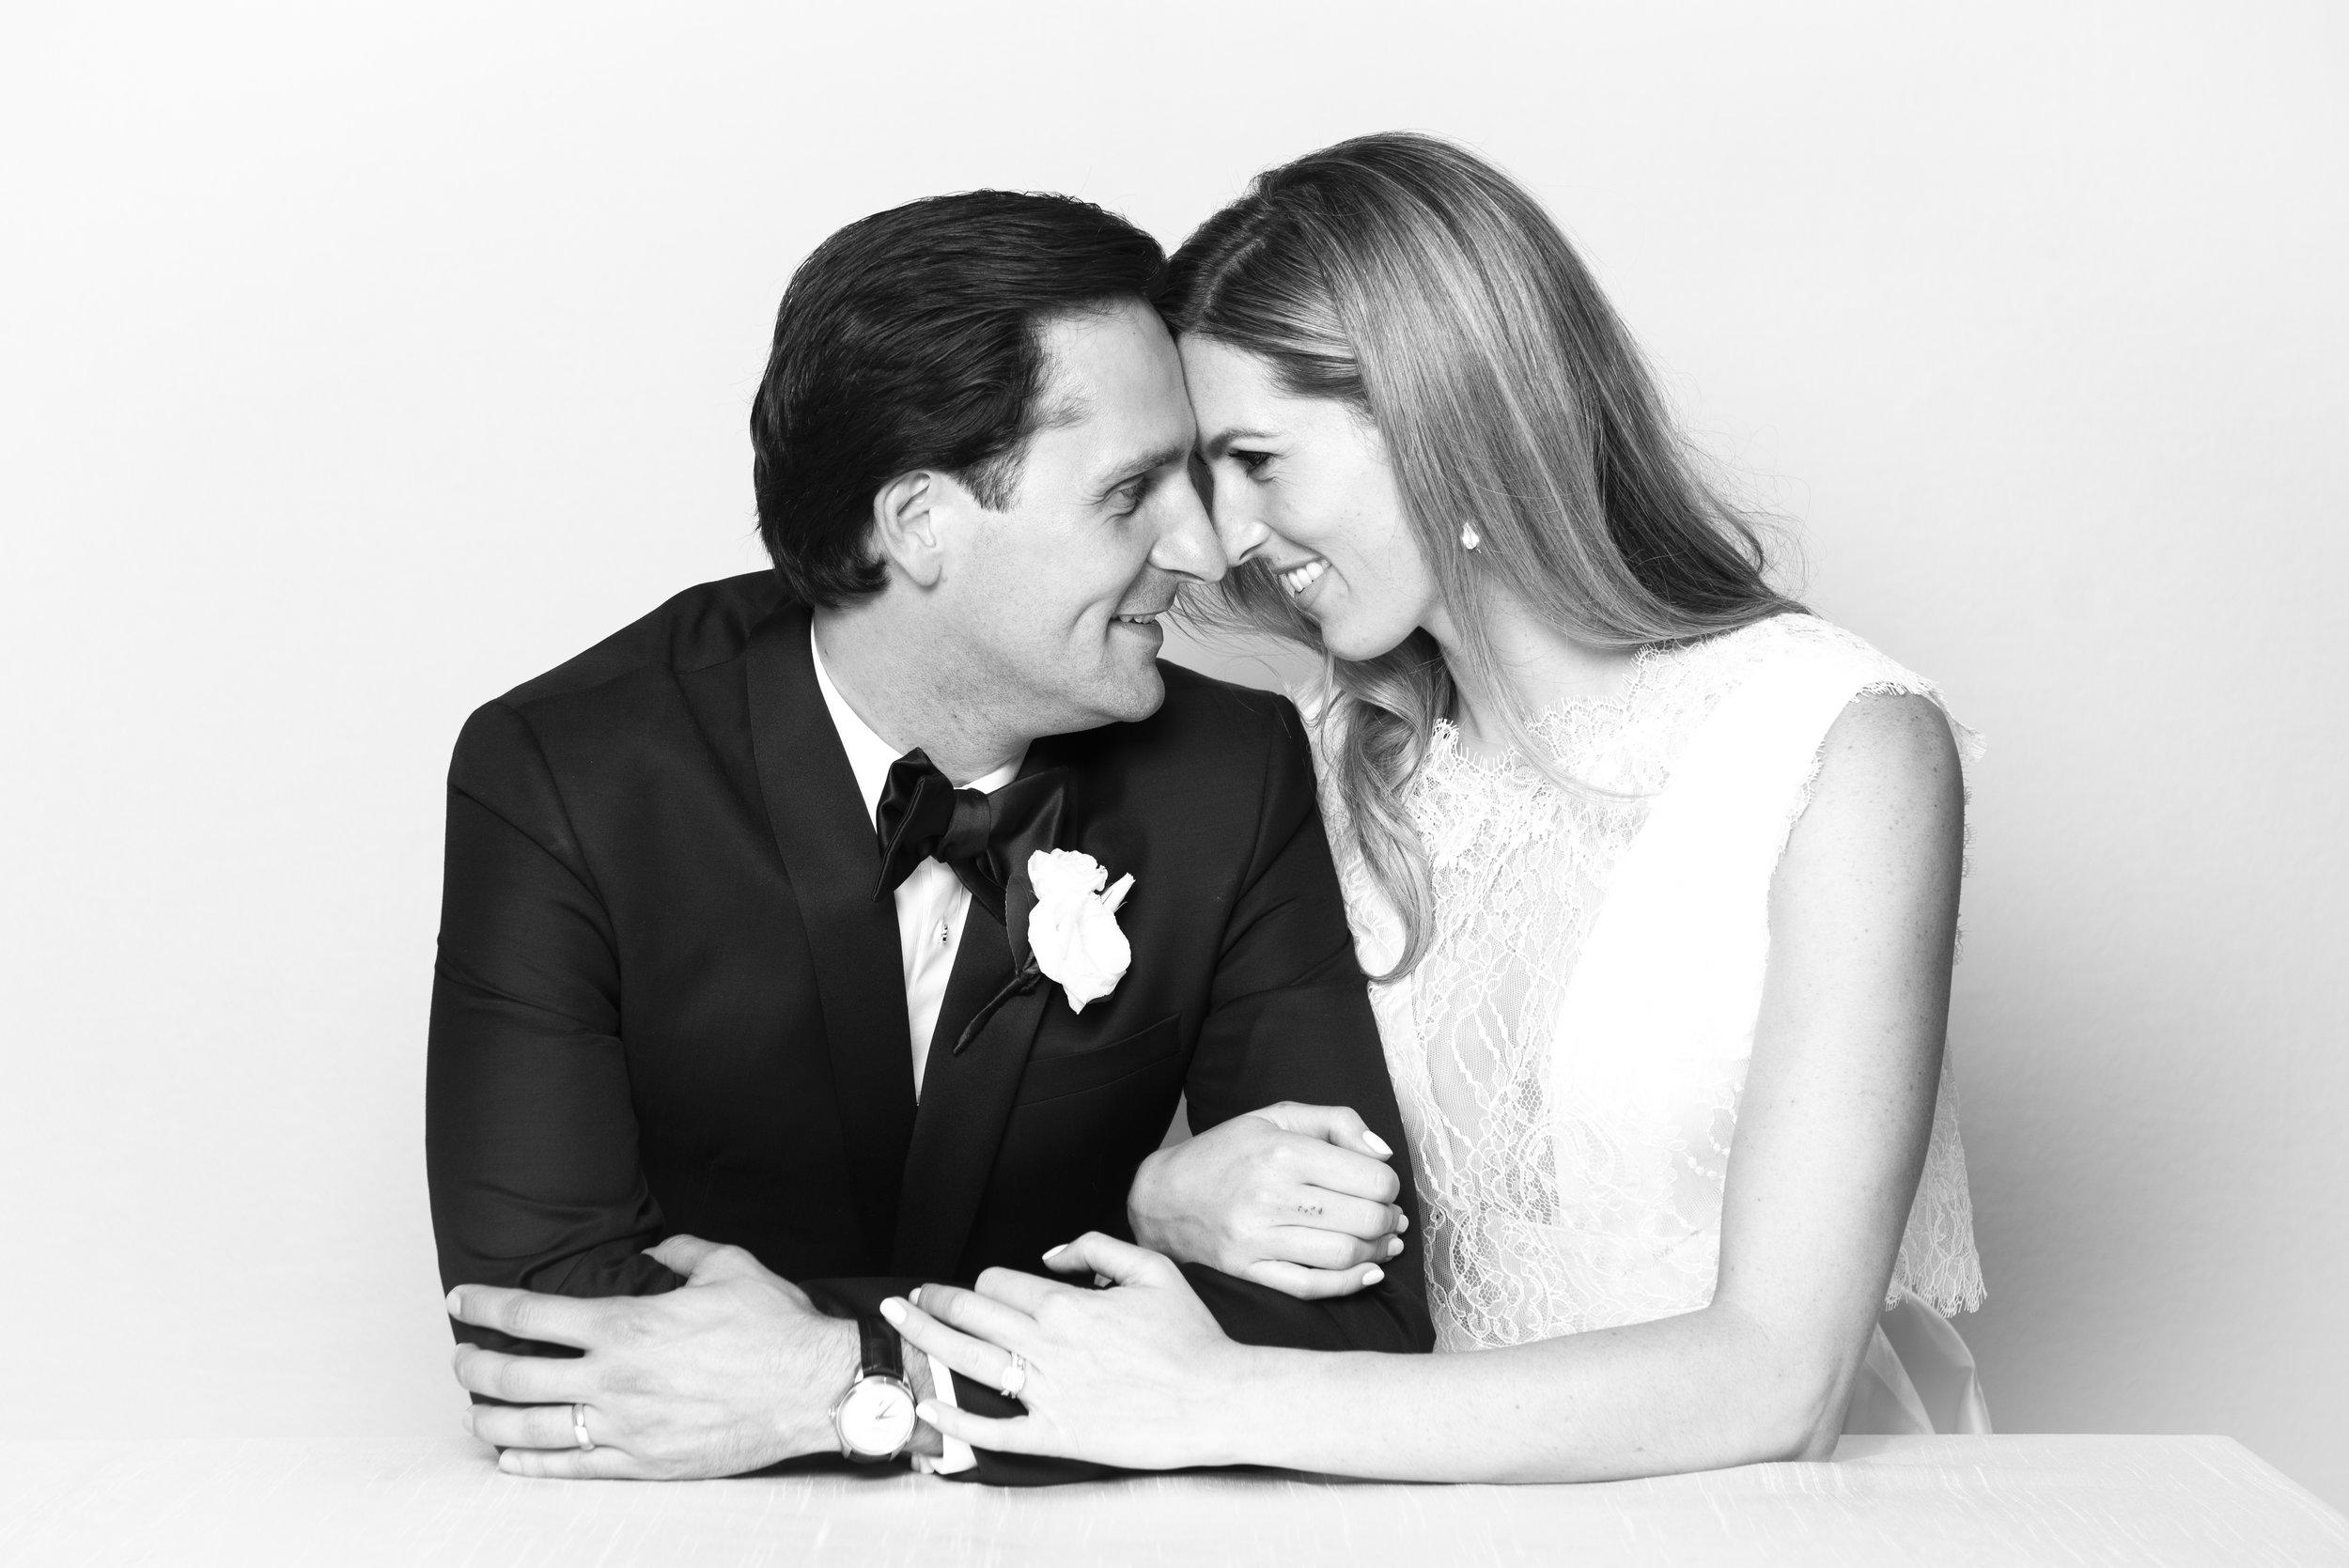 5ive15ifteen-515-Toronto-Wedding-Photographer-Portrait Booth-14.jpg